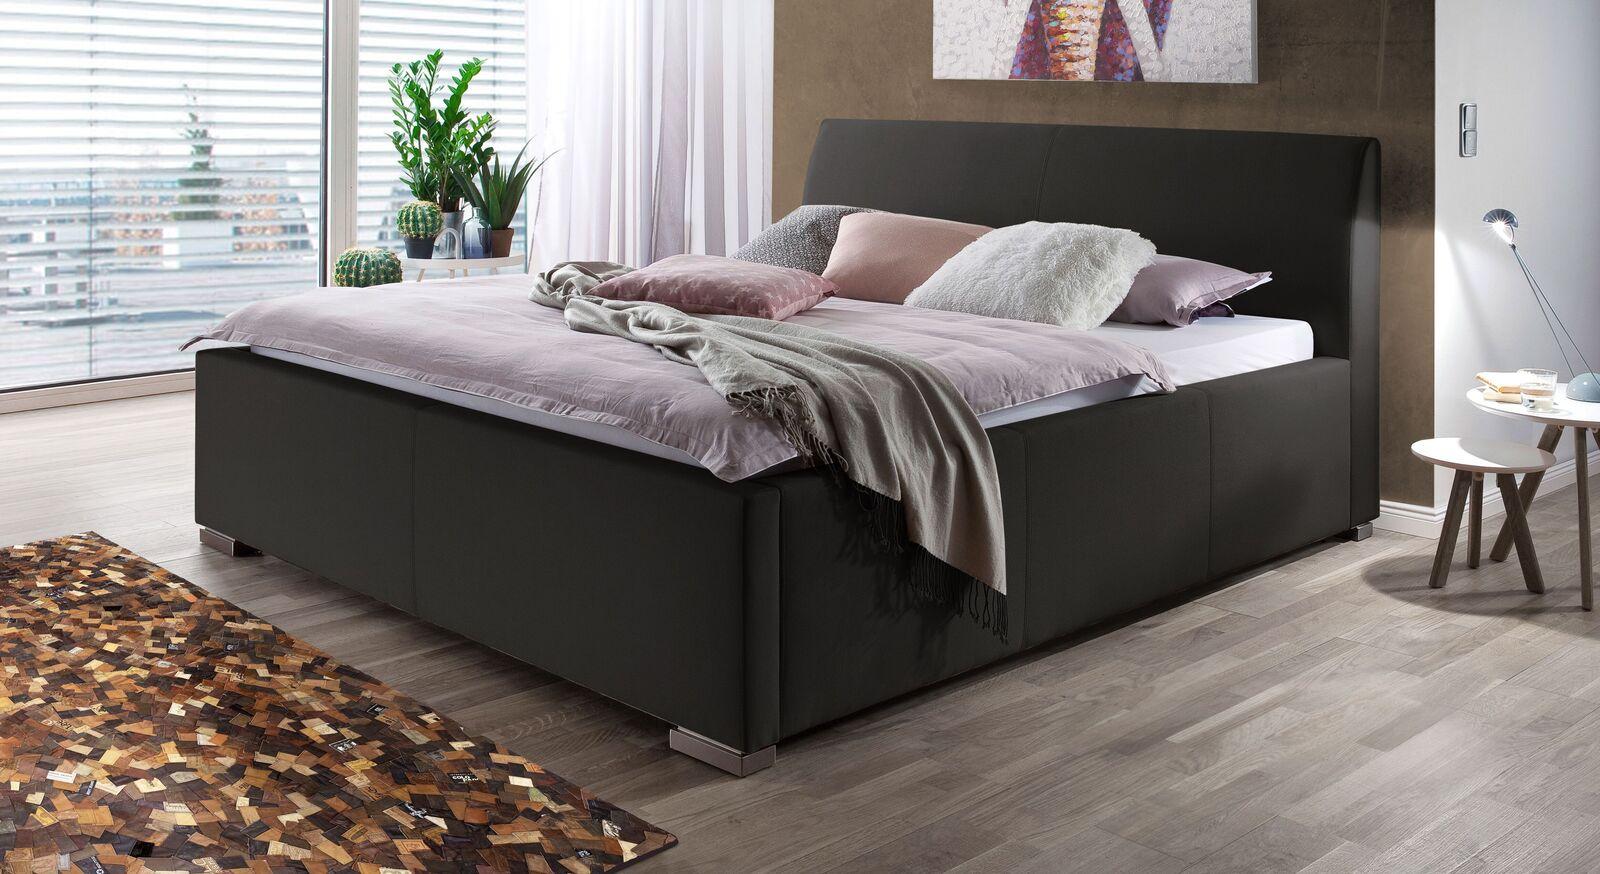 Bett Sesimbra mit schwarzem Webstoffbezug